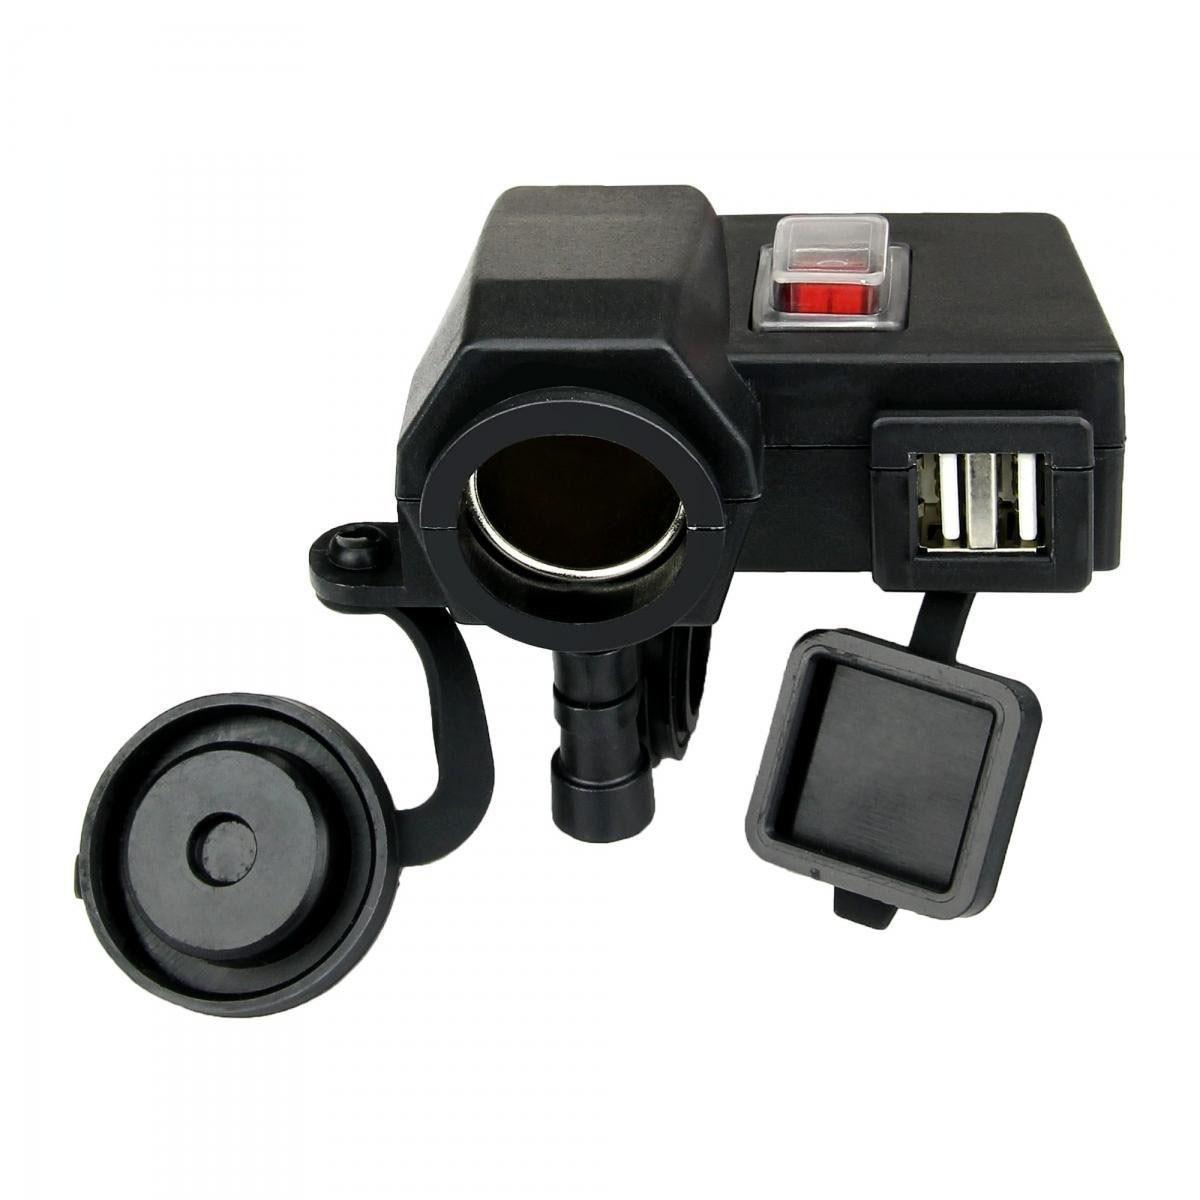 Étanche 5 v/2.1A Dual USB Sortie Moto Guidon support de Chargeur USB Avec DC 12 v Voiture Allume-cigare socket